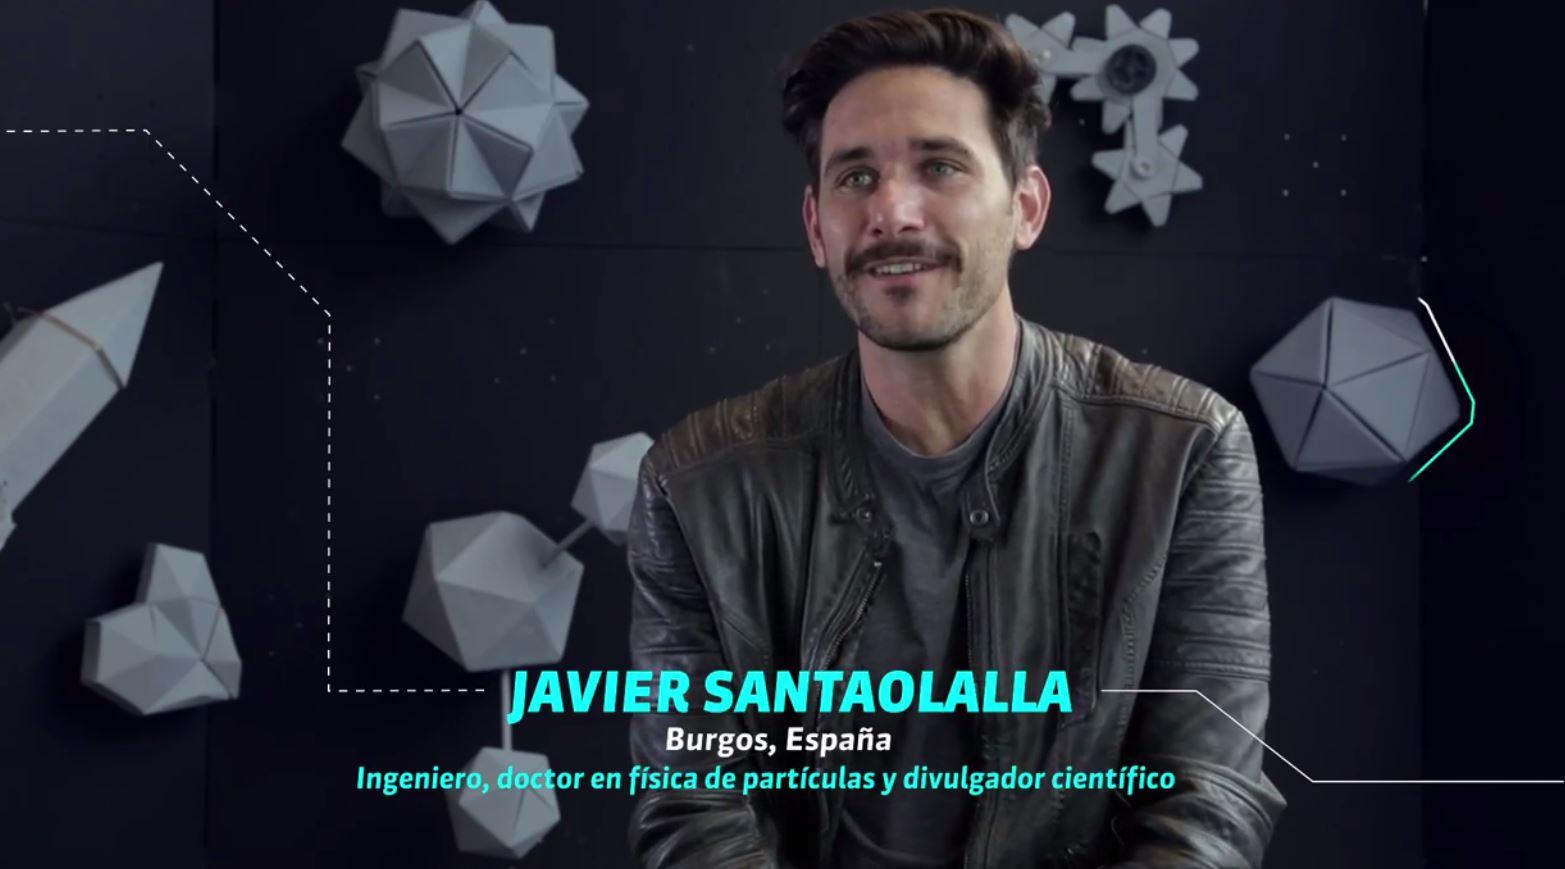 Javier Santaolla